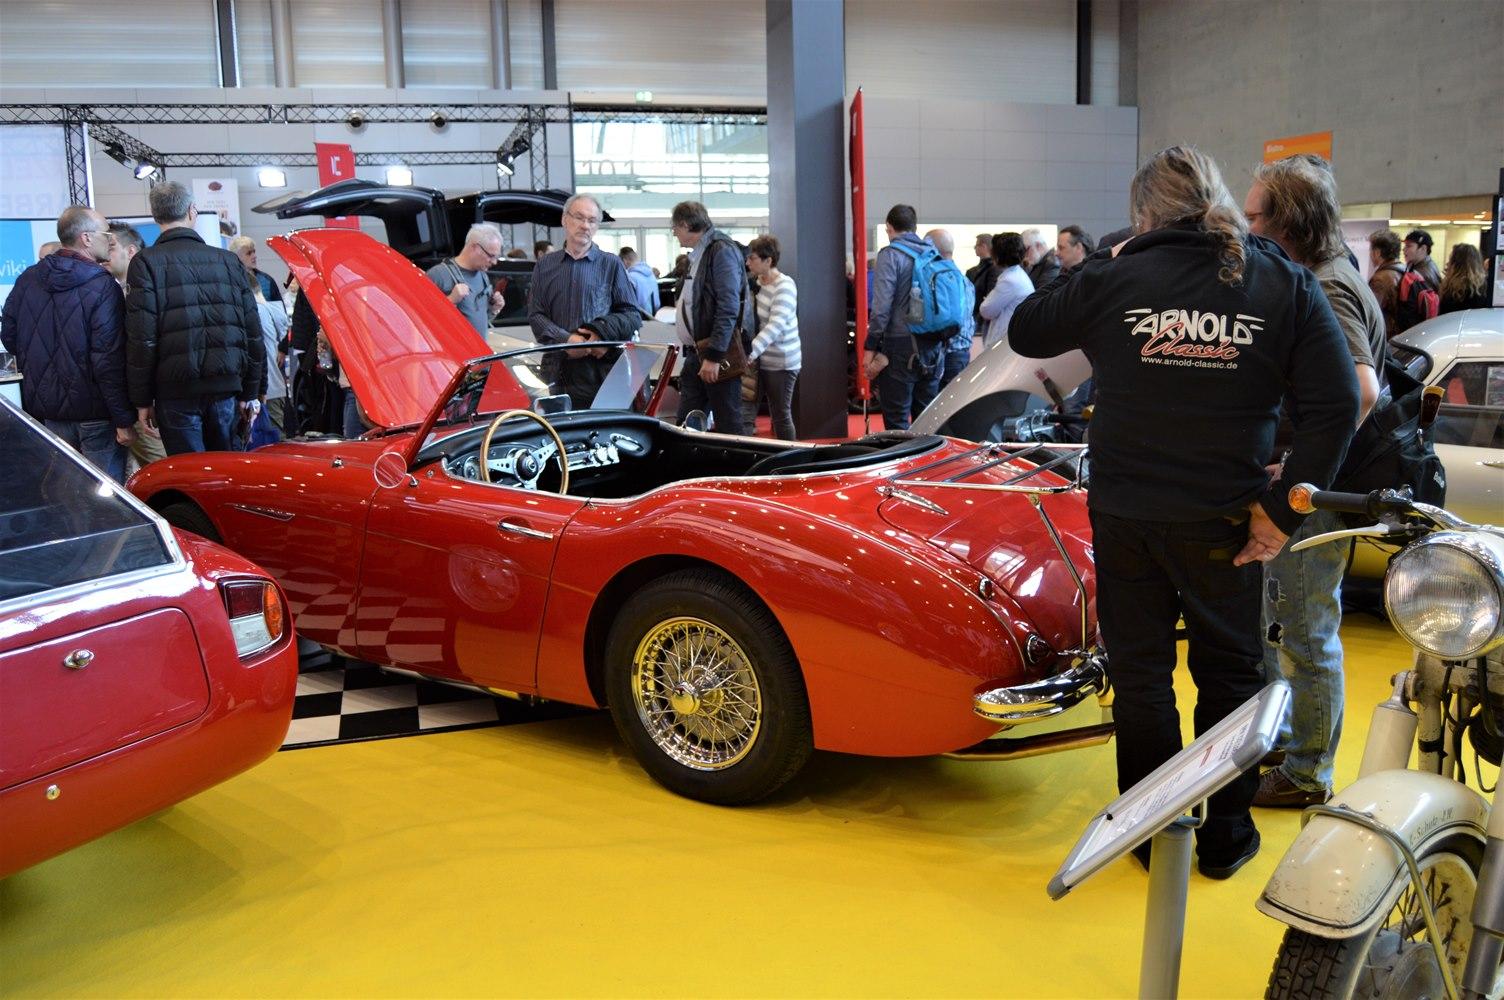 Austin-Healey 3000 - Retro Classics Stuttgart 2018 Arnold Classic Oldtimer